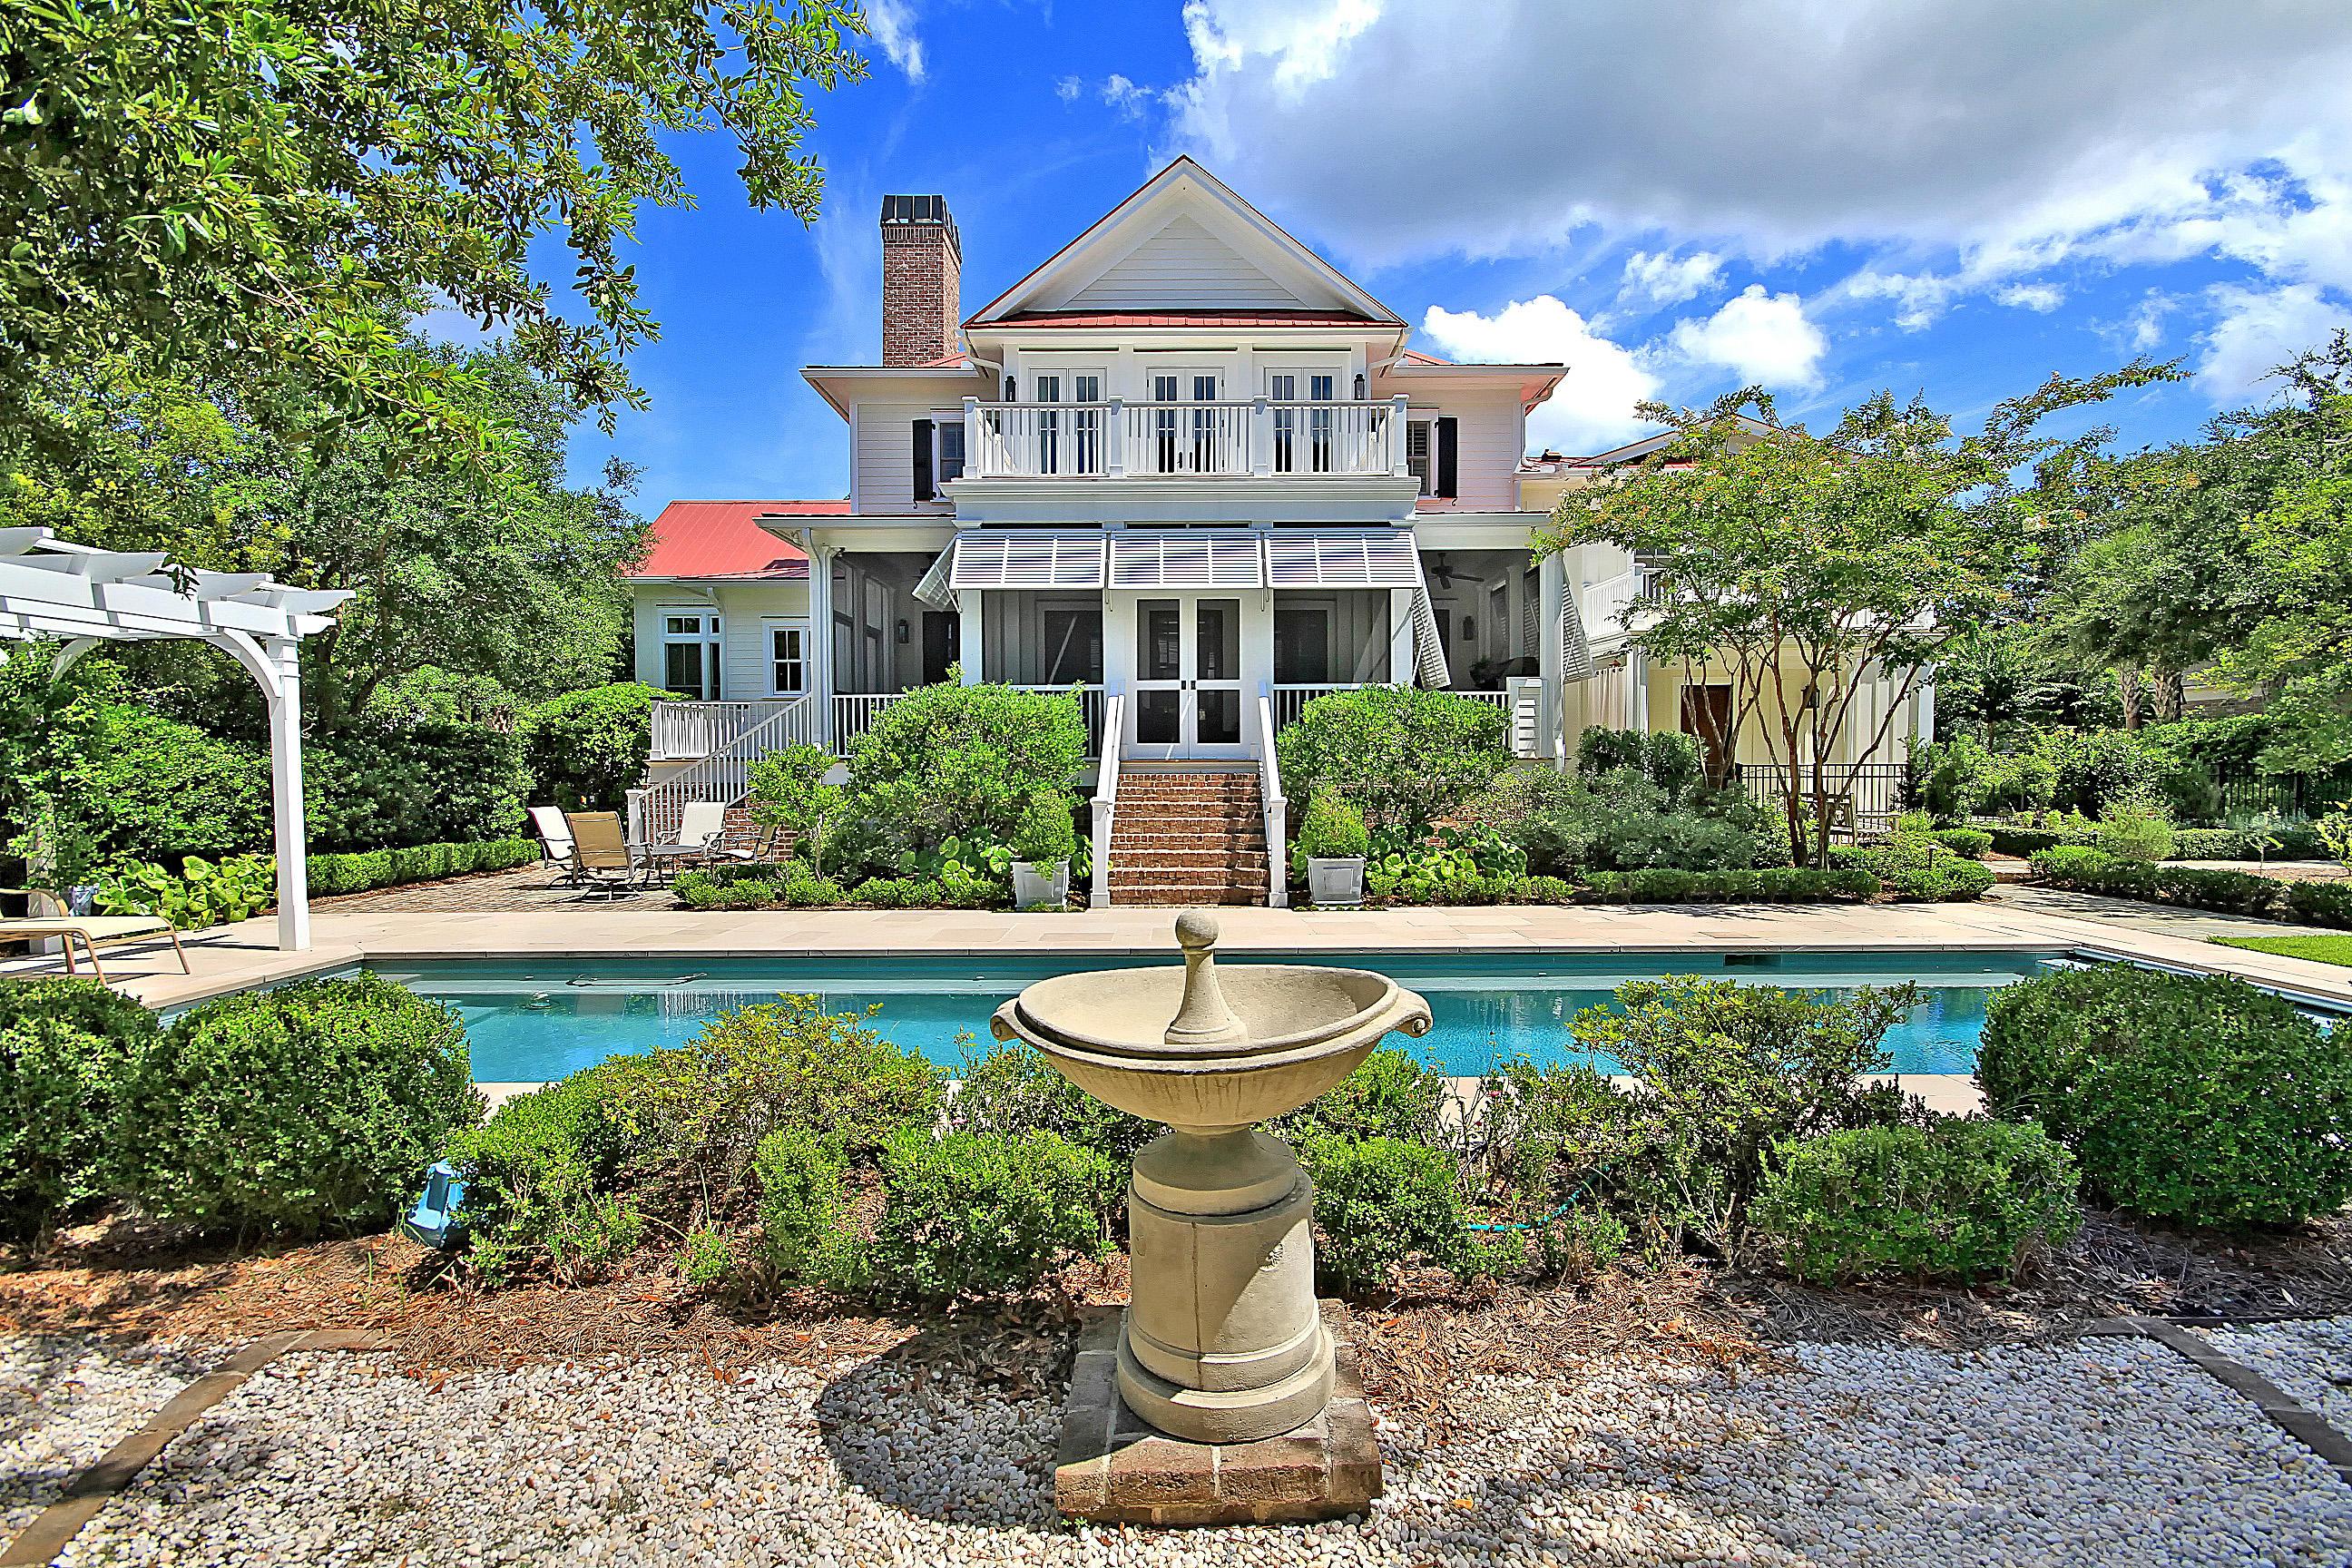 Daniel Island Homes For Sale - 520 Island Park, Daniel Island, SC - 4